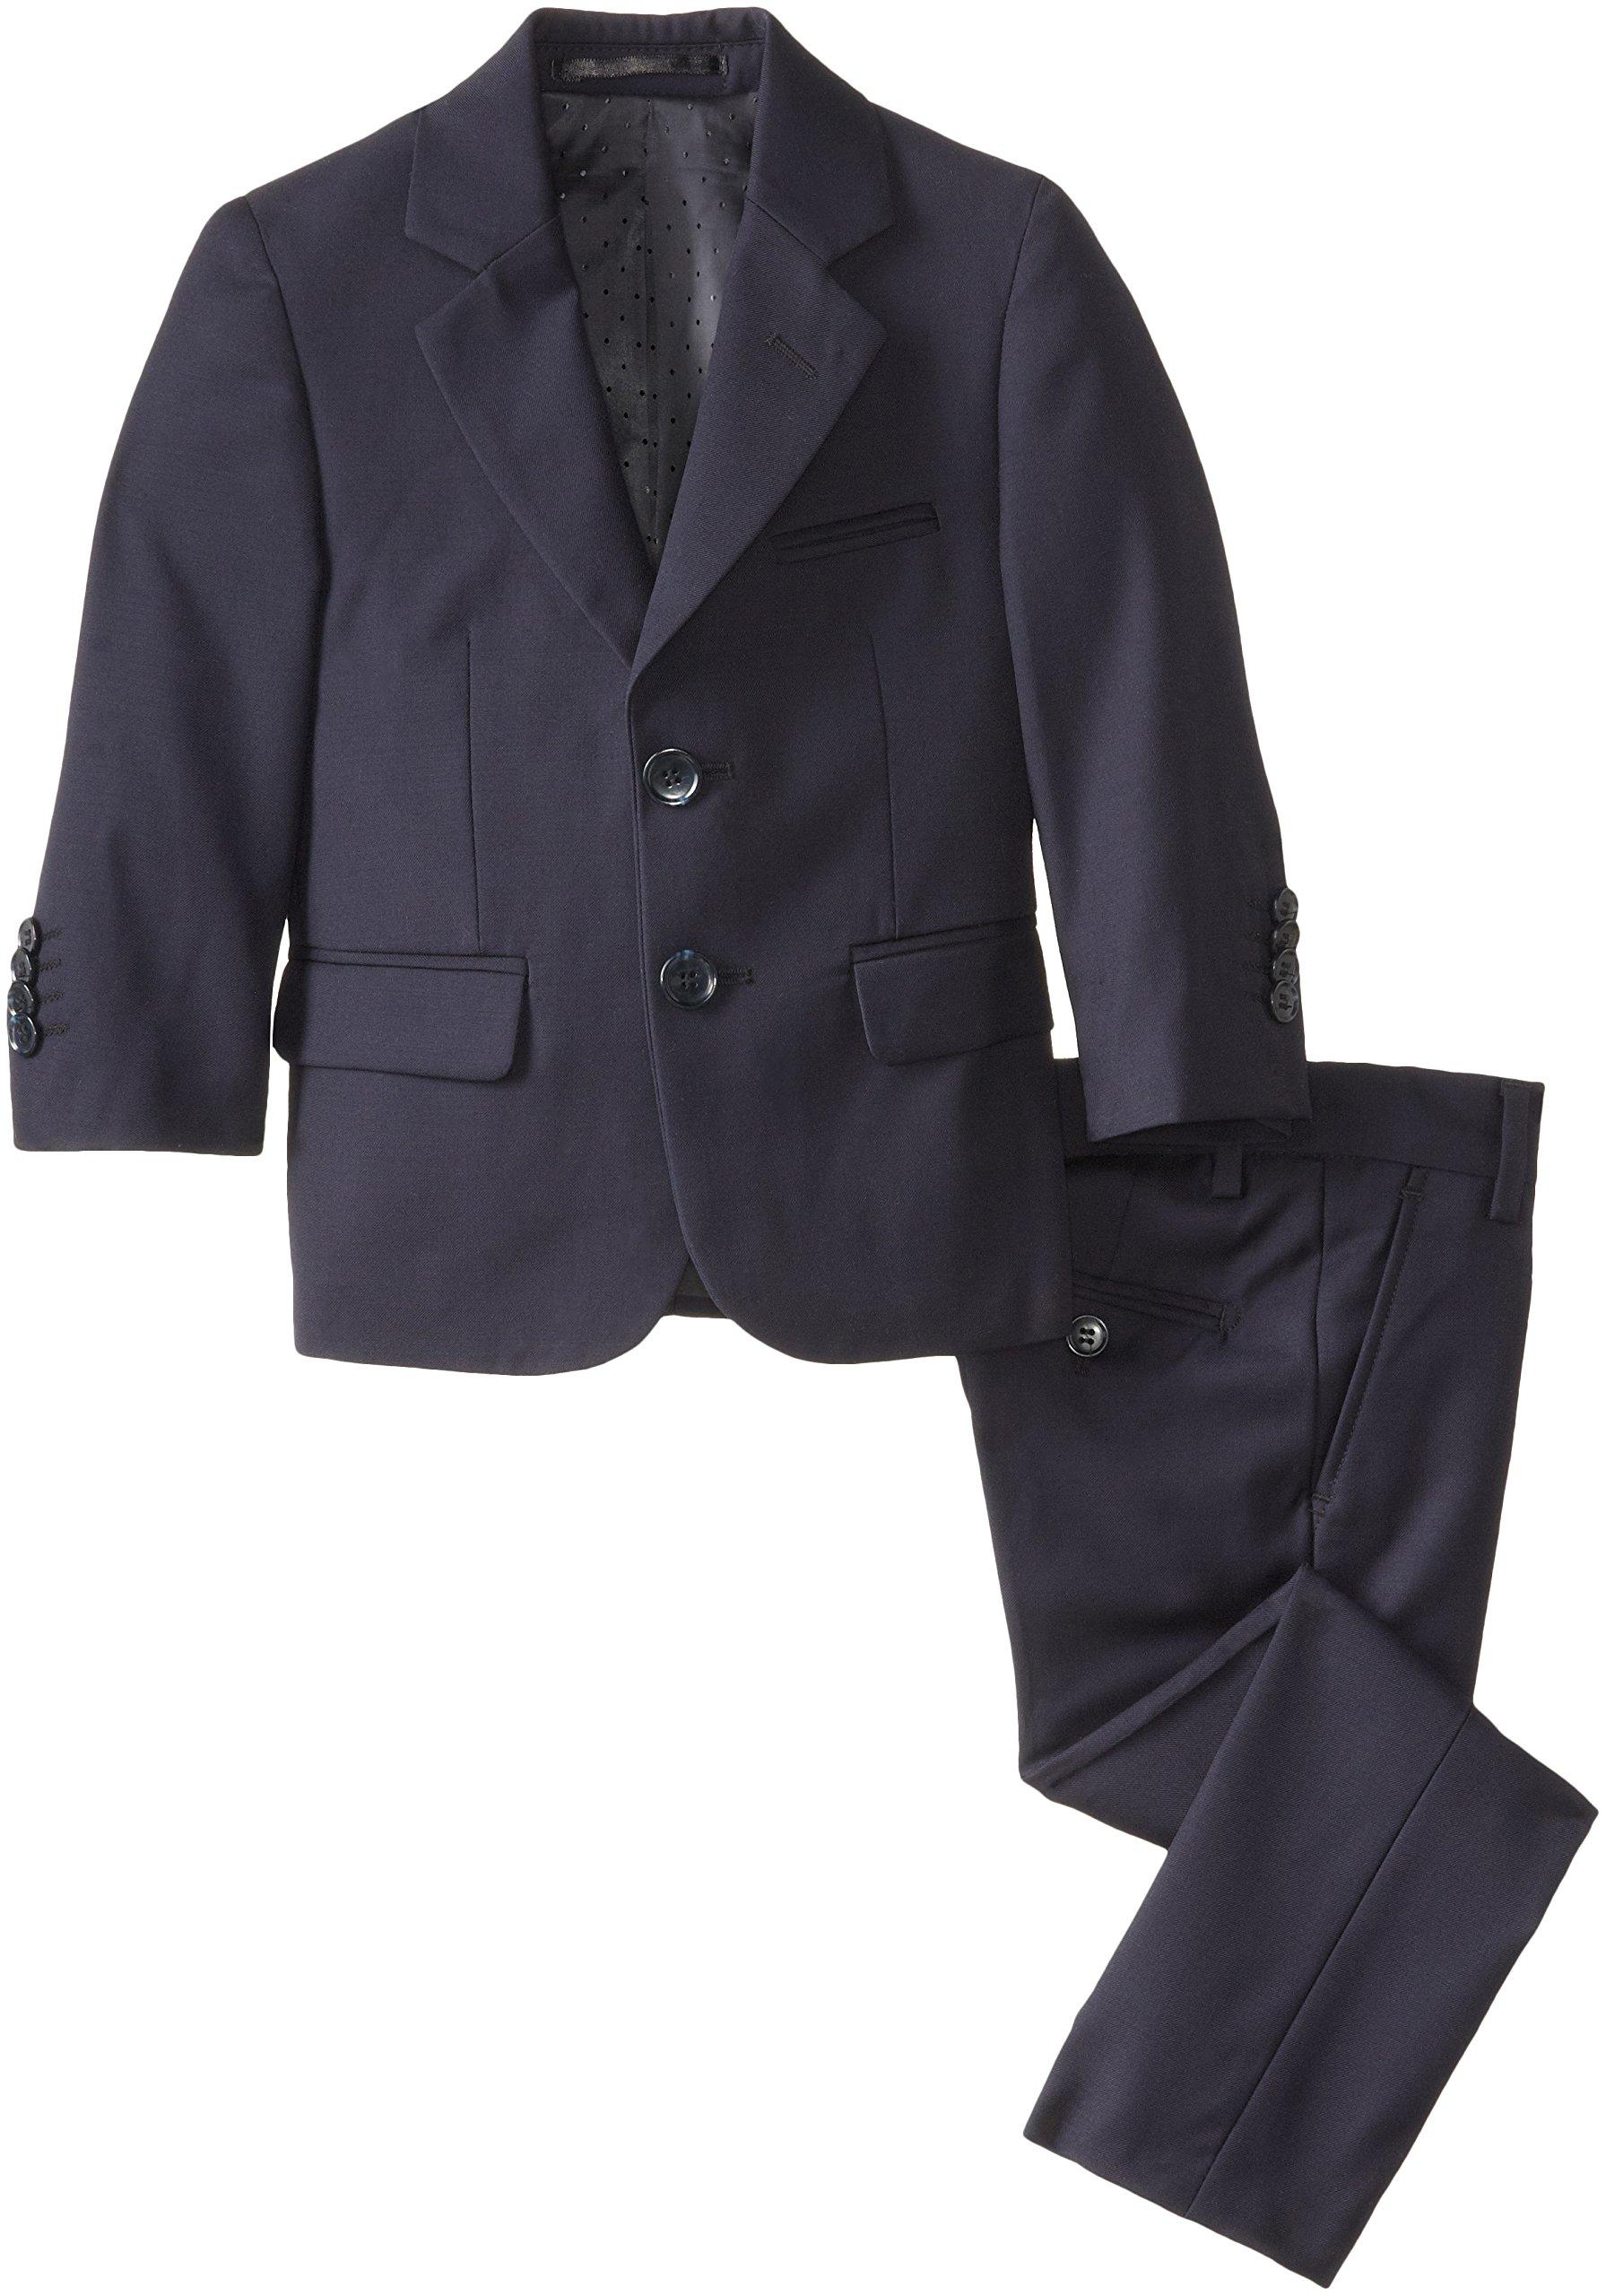 Isaac Mizrahi Black Label Little Boys' Slim-Fit Wool 2 Piece Solid Suit, Navy, 7